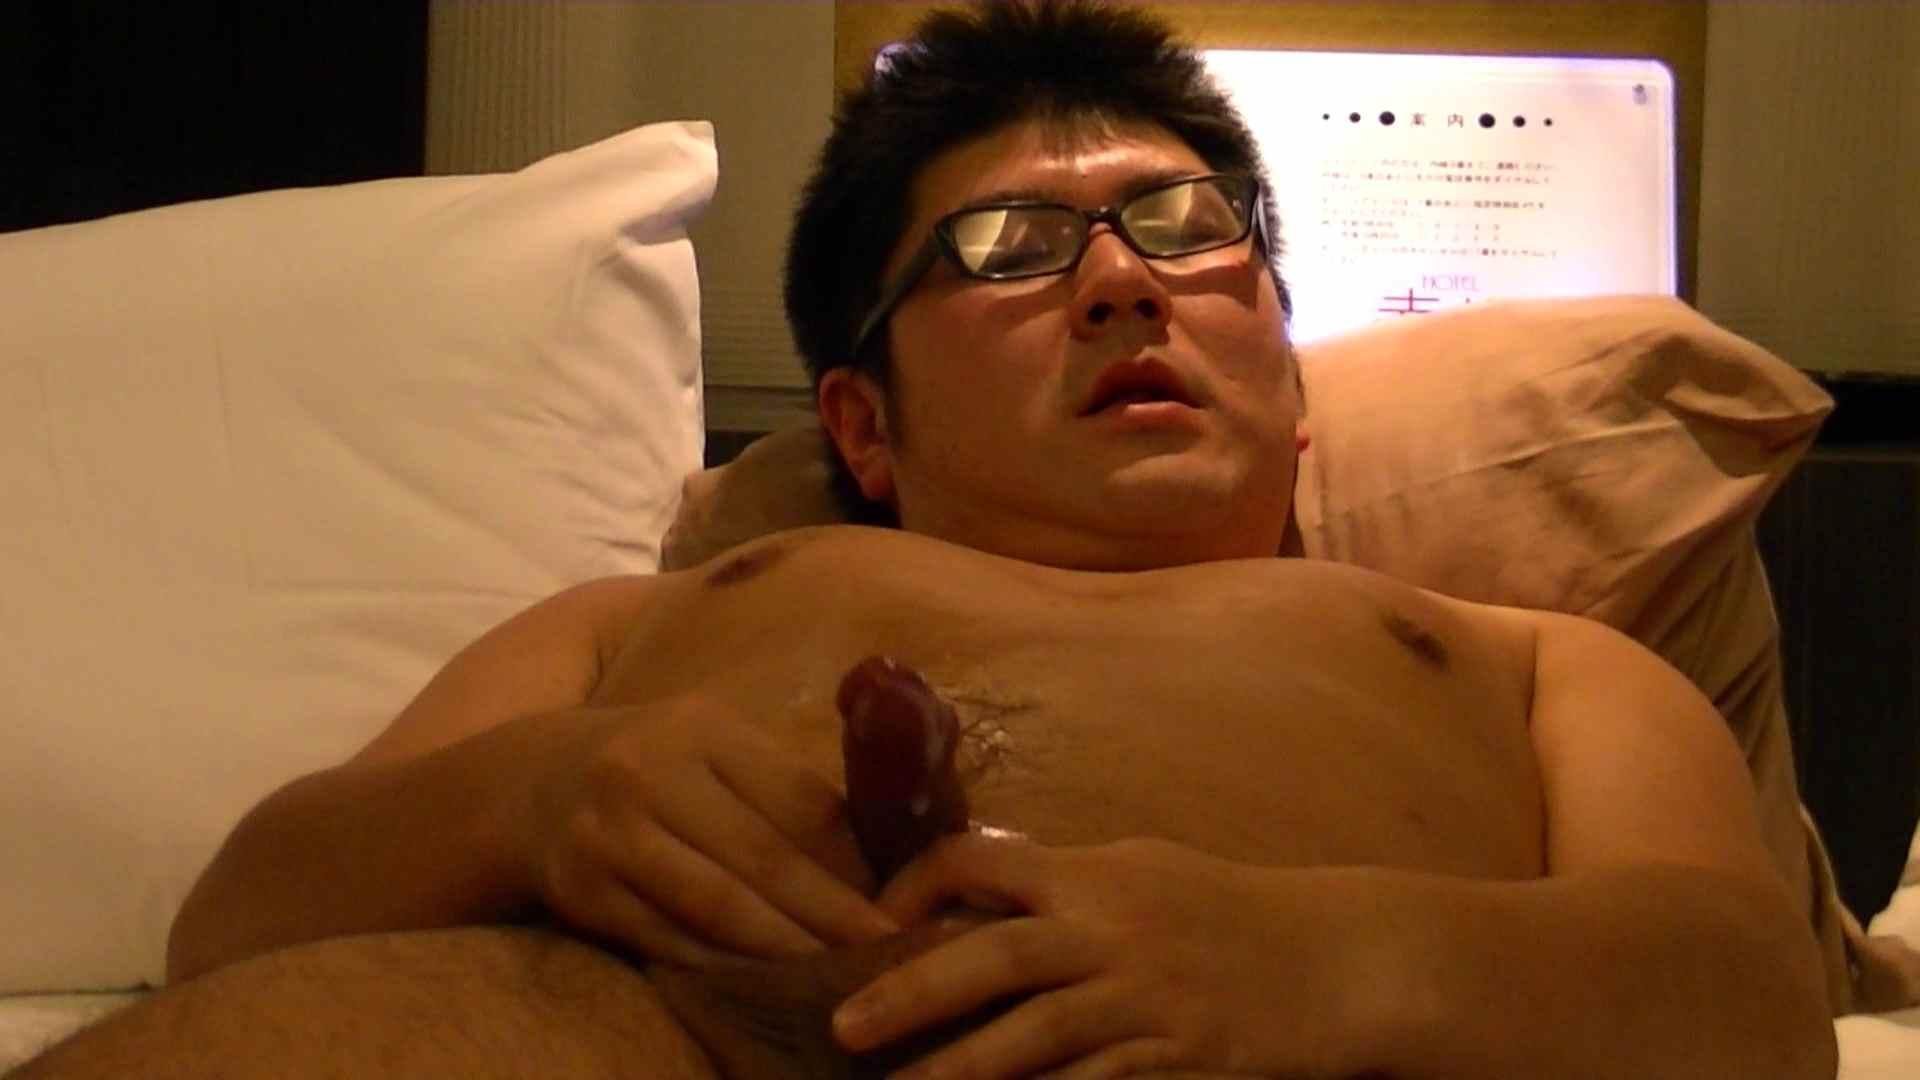 Mr.オナックスさん投稿!HD 貴方のオナニー三万円で撮影させてください。VOL.03 後編 投稿 ゲイ無修正ビデオ画像 106枚 21